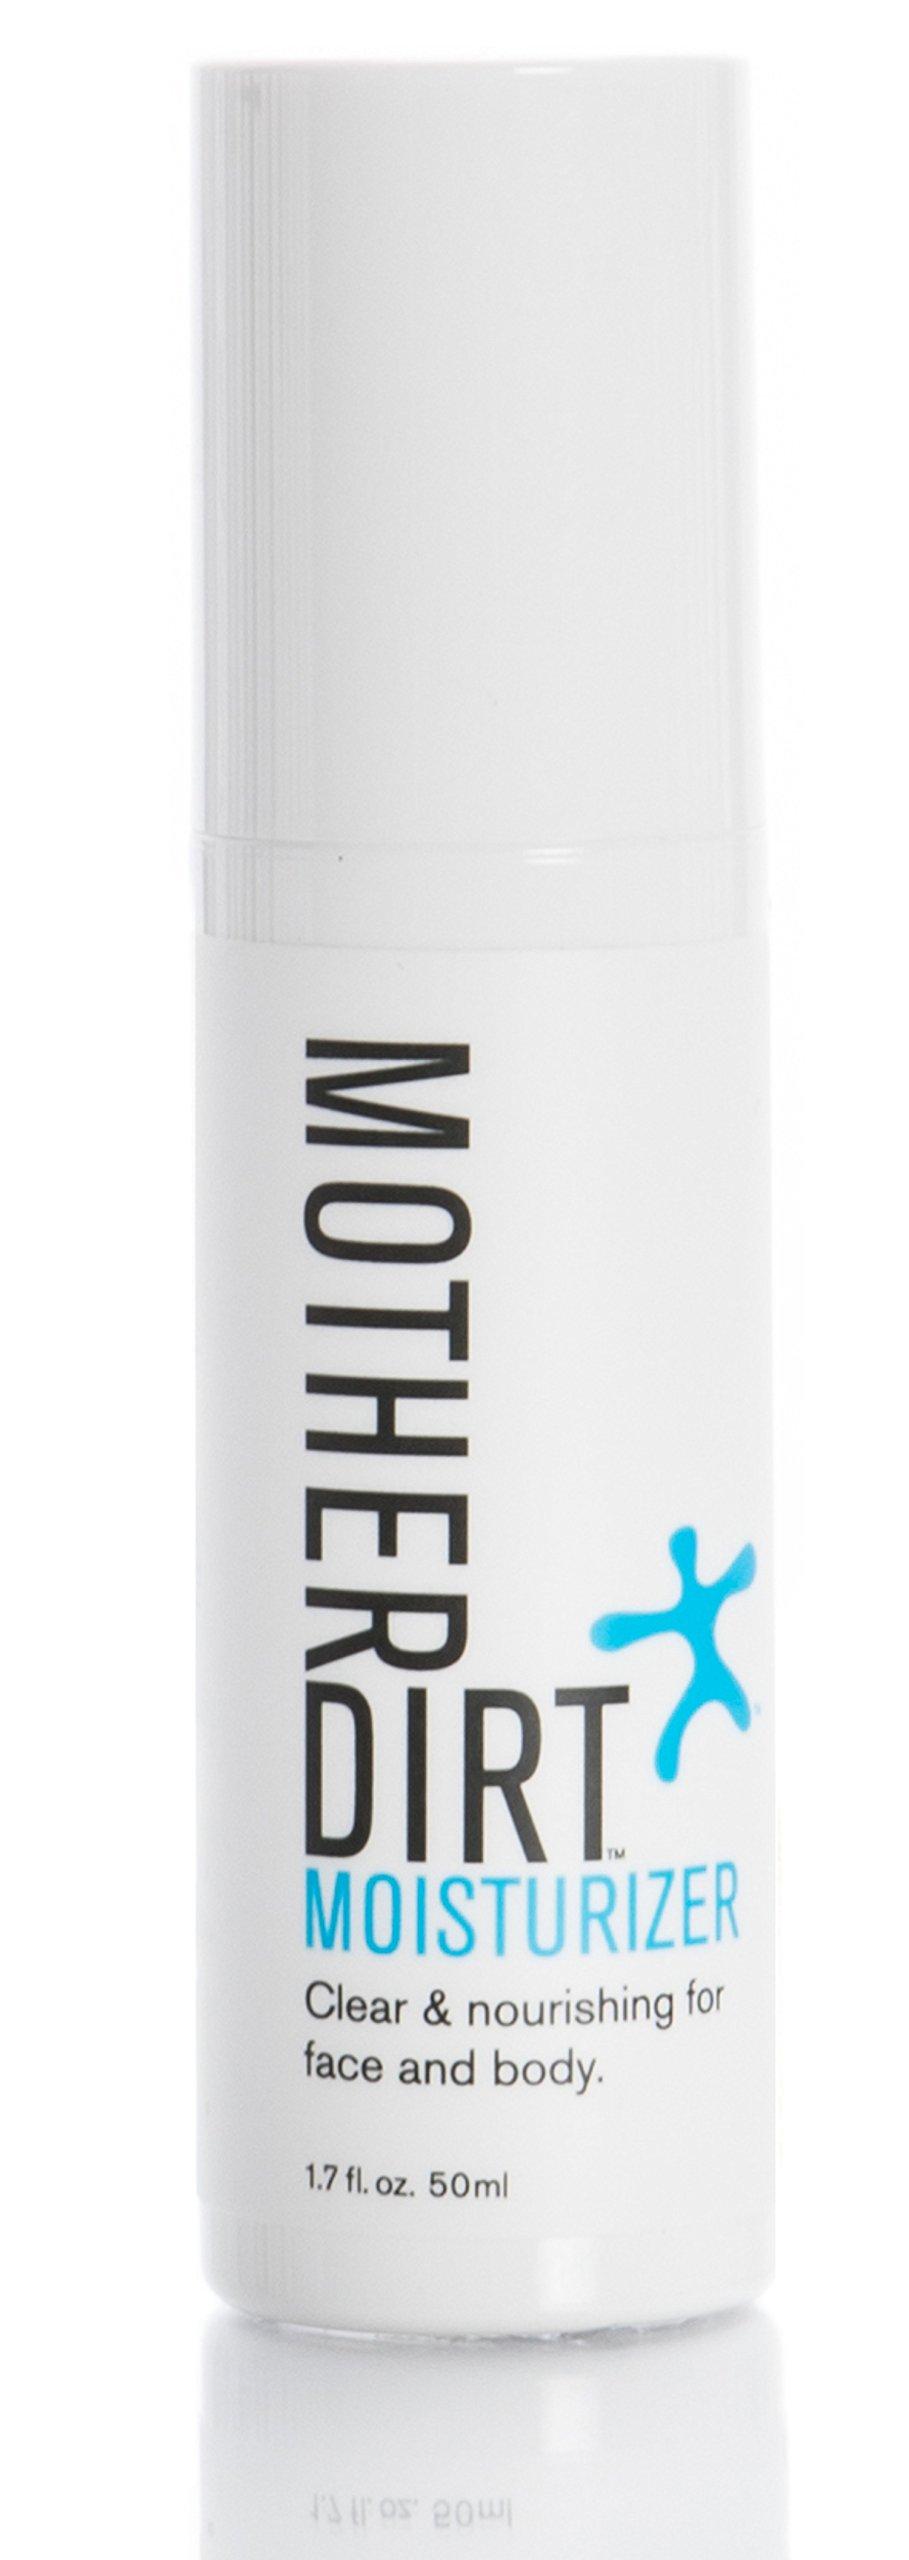 Mother Dirt Moisturizer, Preservative-free, Unfragranced, Biome-Friendly, 1.7 fl oz